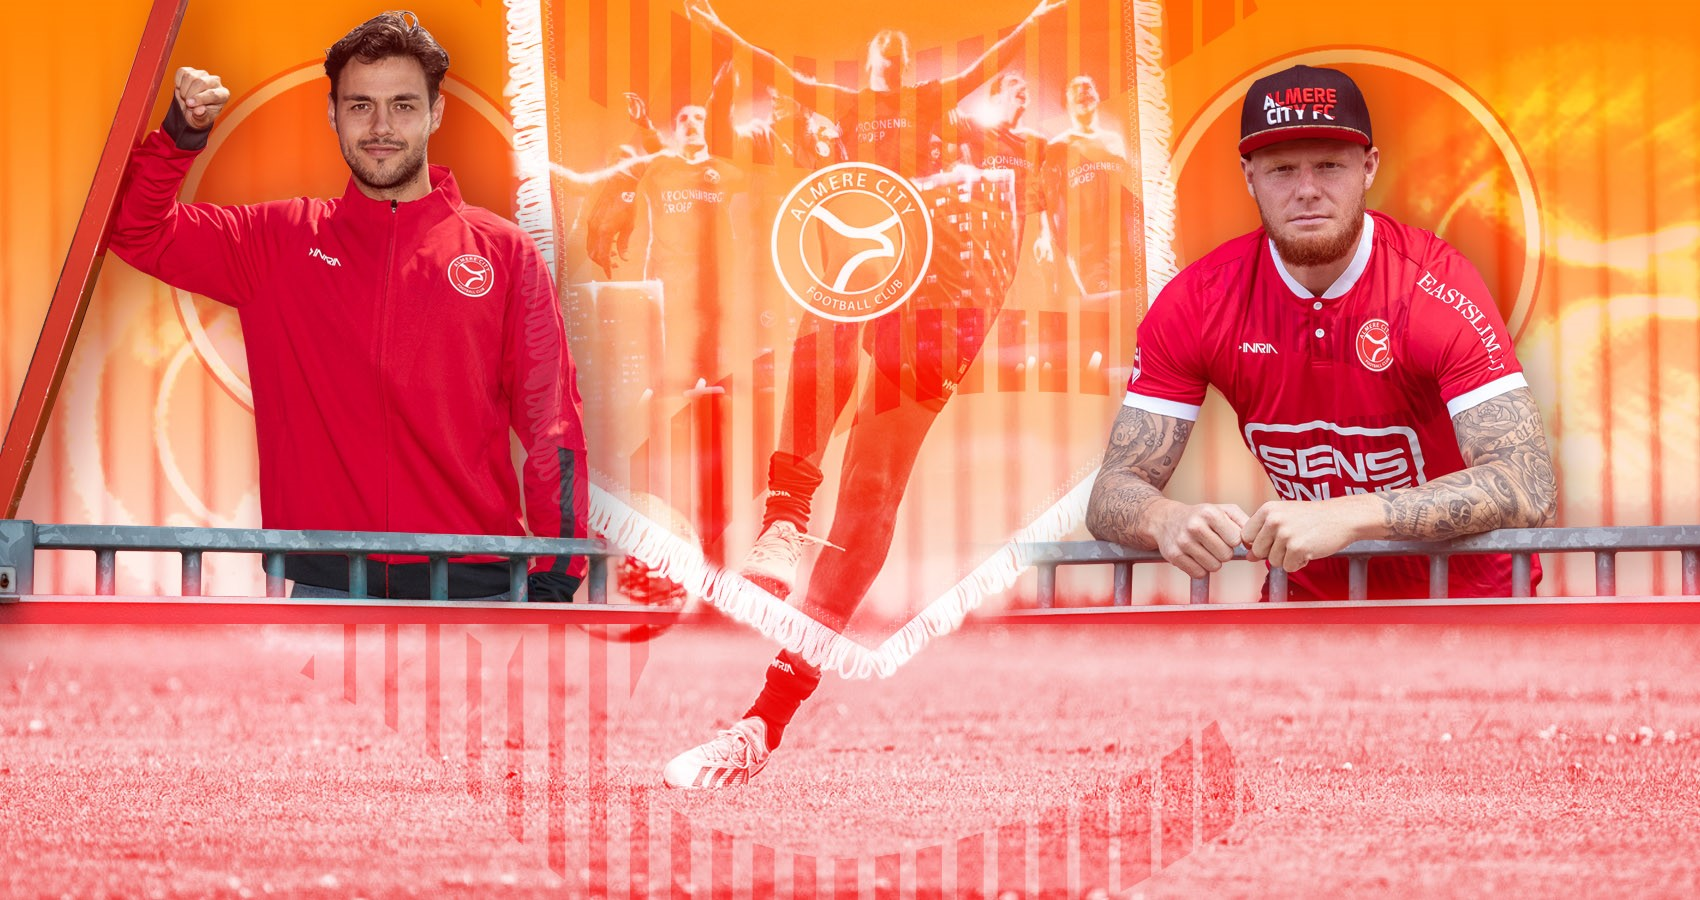 Koningsdagkleedje: mega online sale Almere City FC